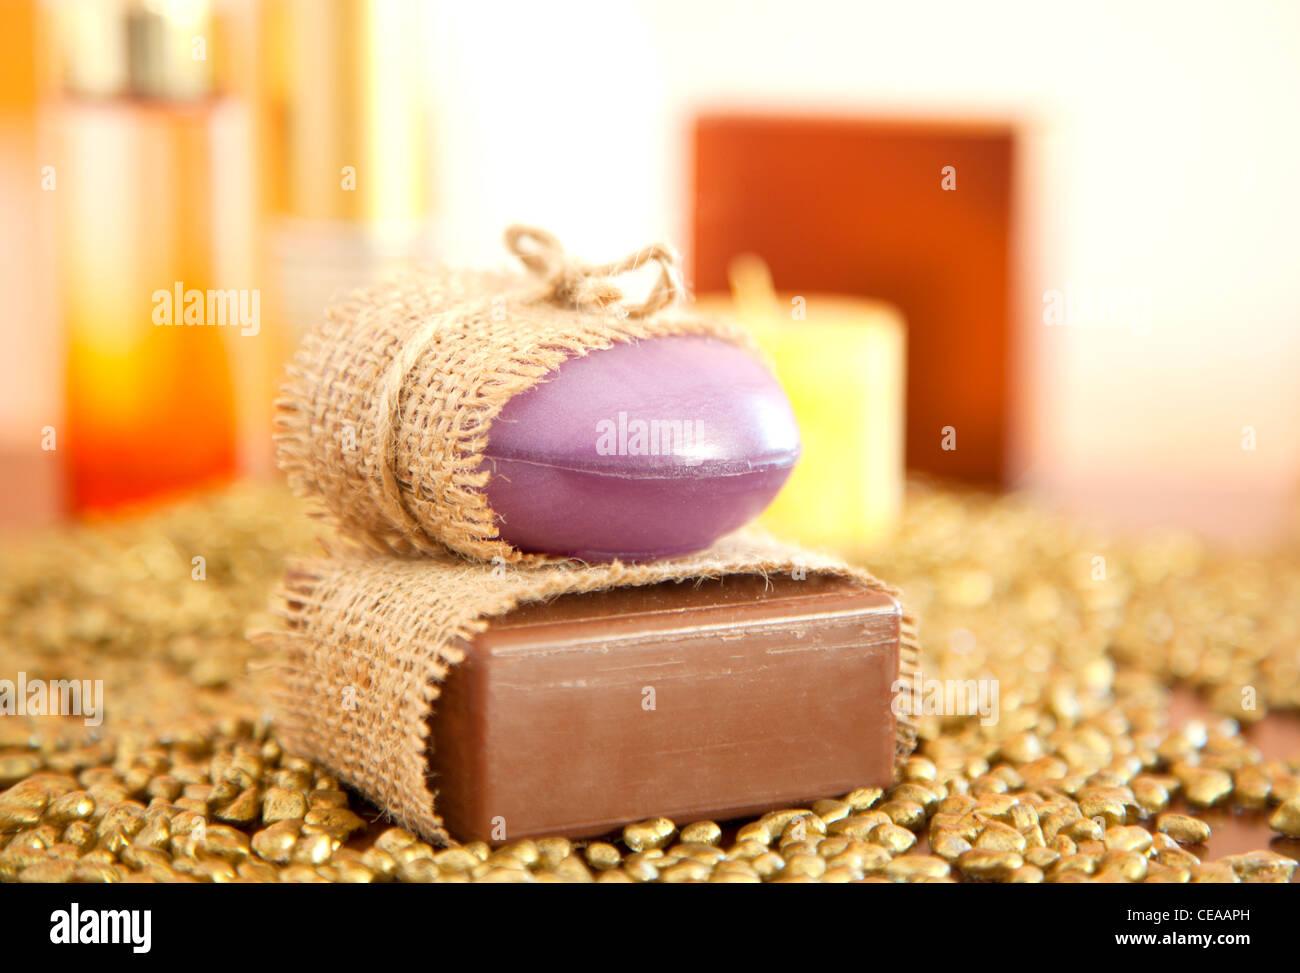 Handmade Soap closeup. - Stock Image